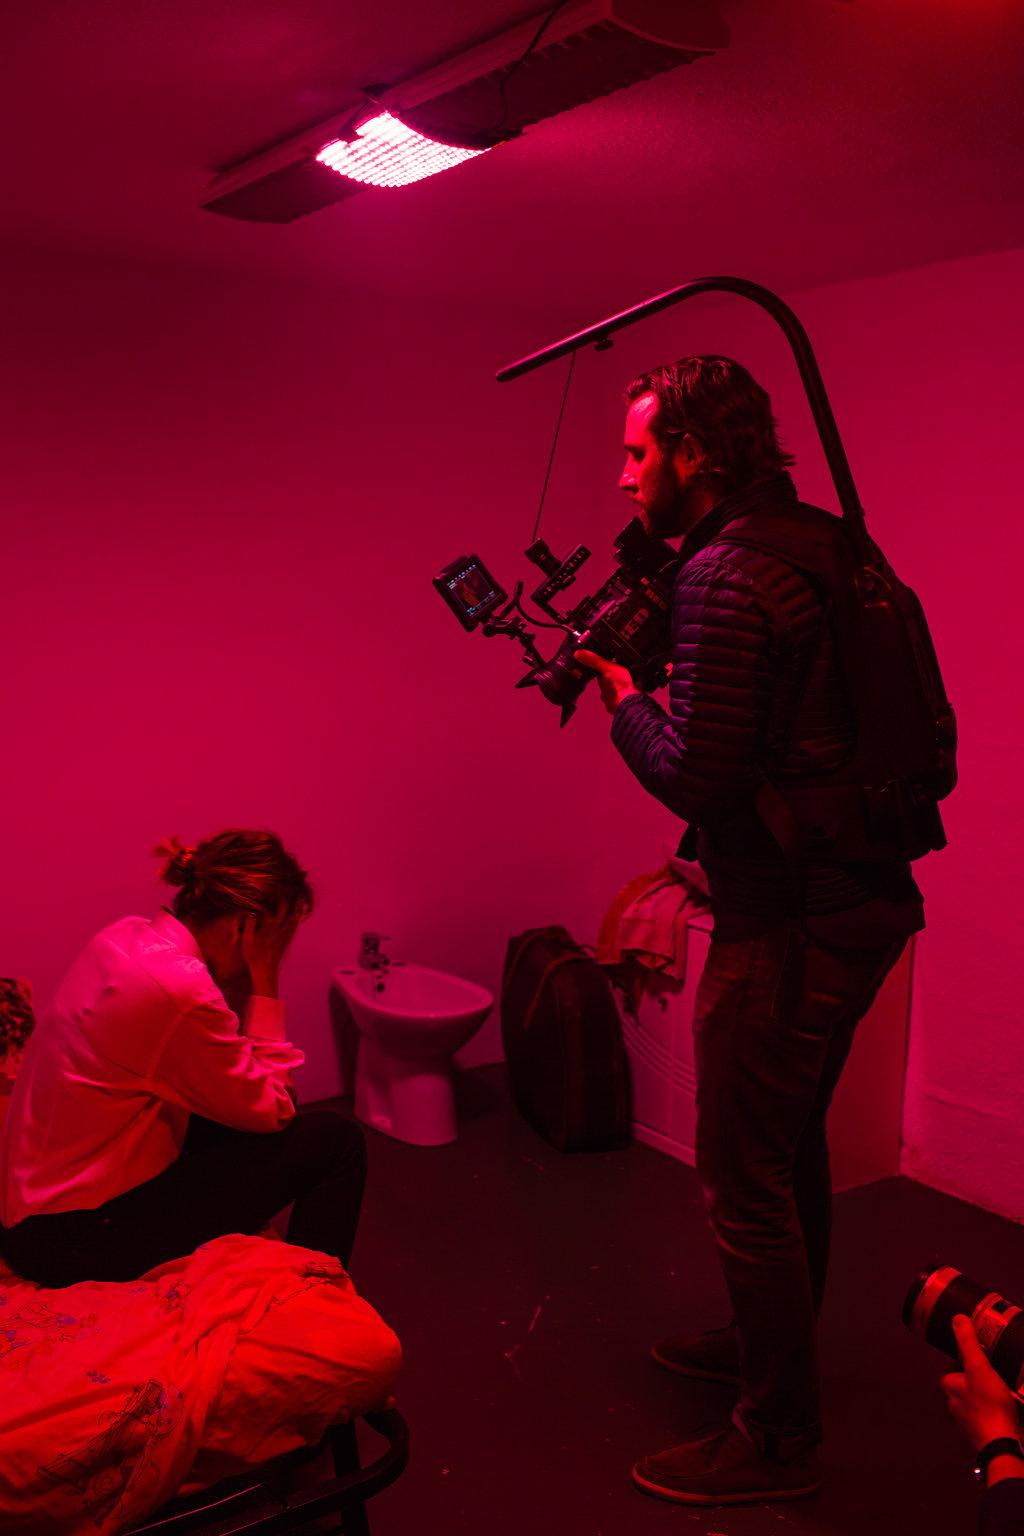 #filmmakerfriday Bittersweet Creative BTS 4